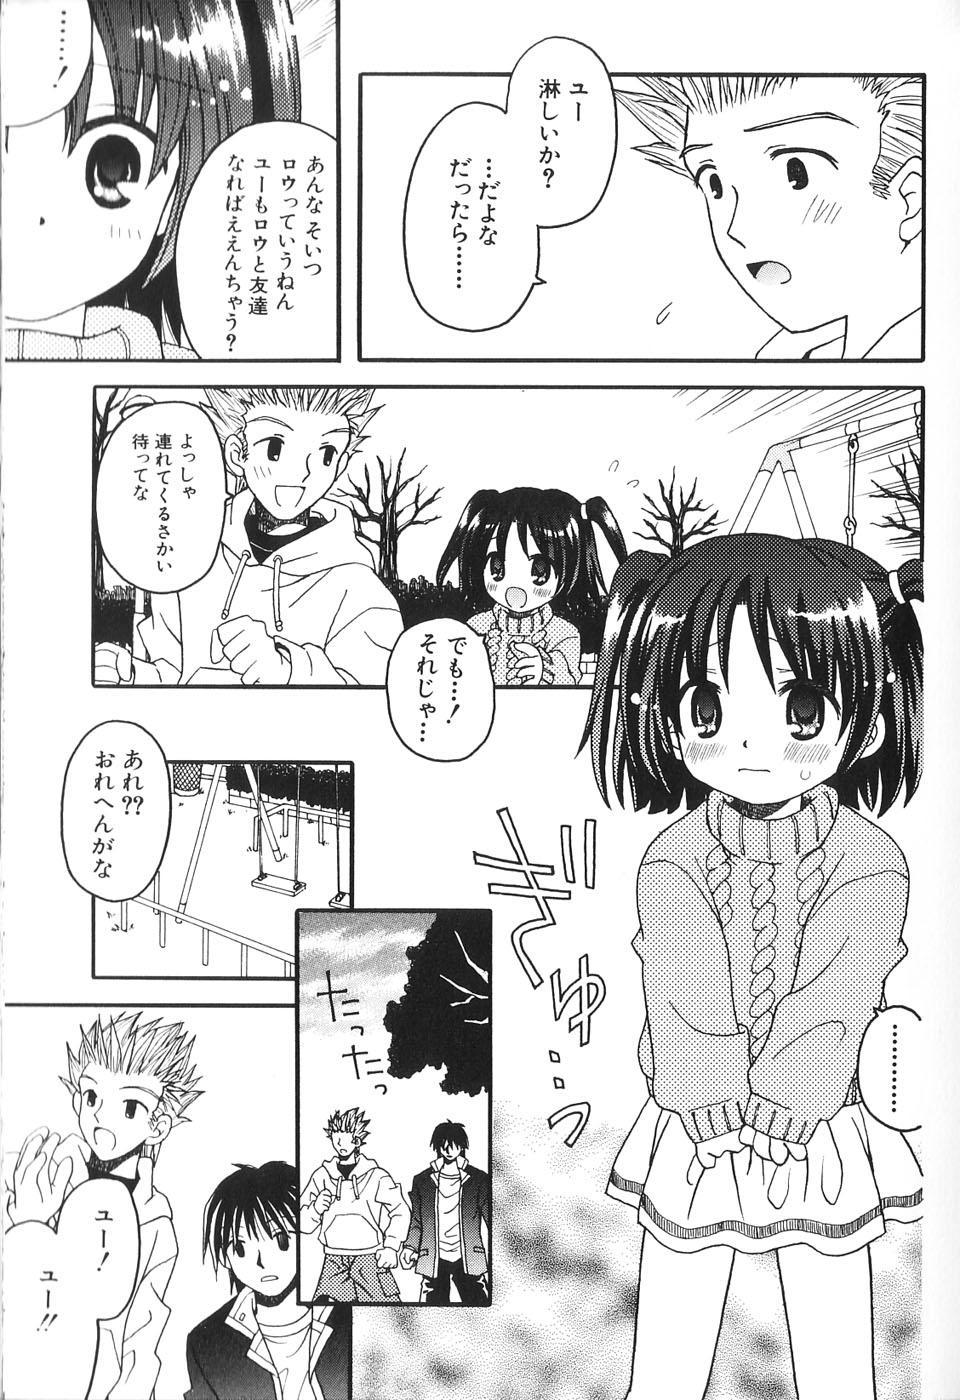 Musoubana 34